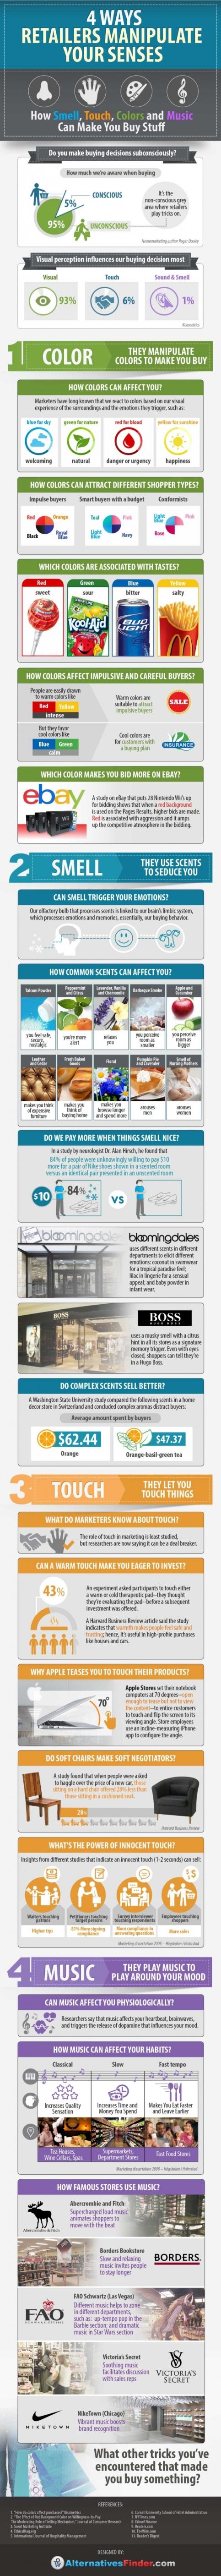 manipulate-senses-infographic